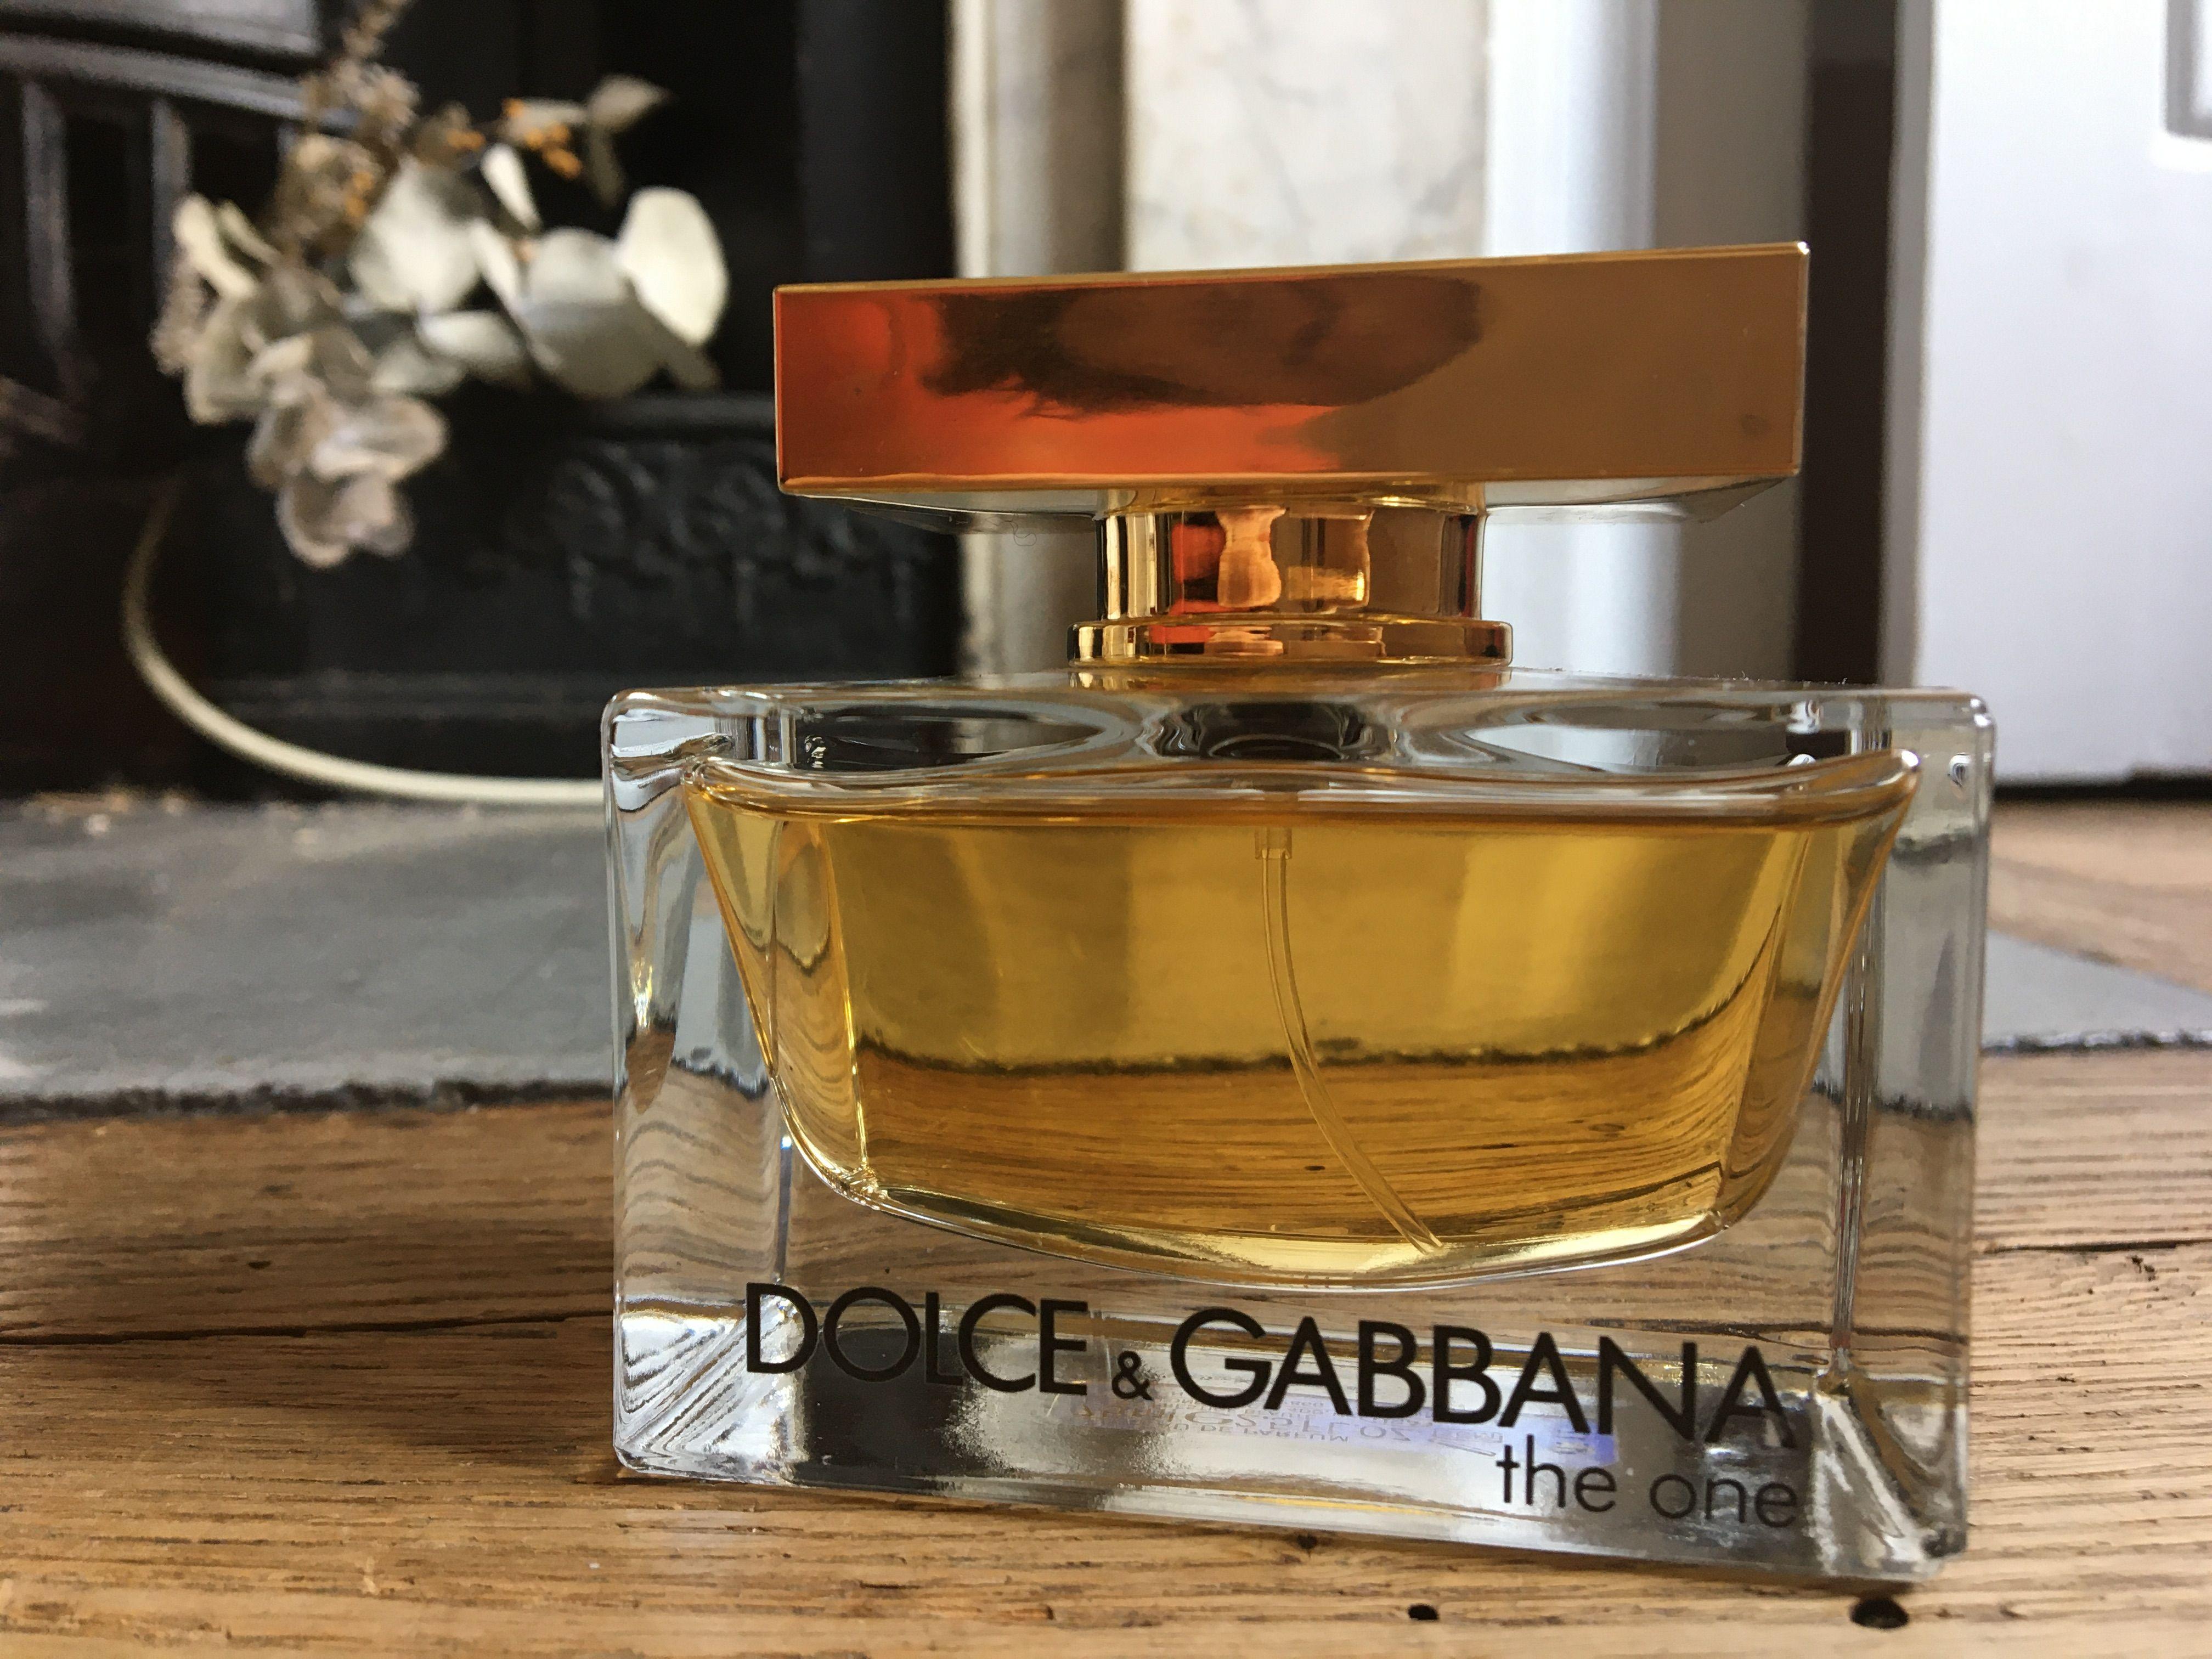 Parfum Dolce Gabbana the one - 75ml